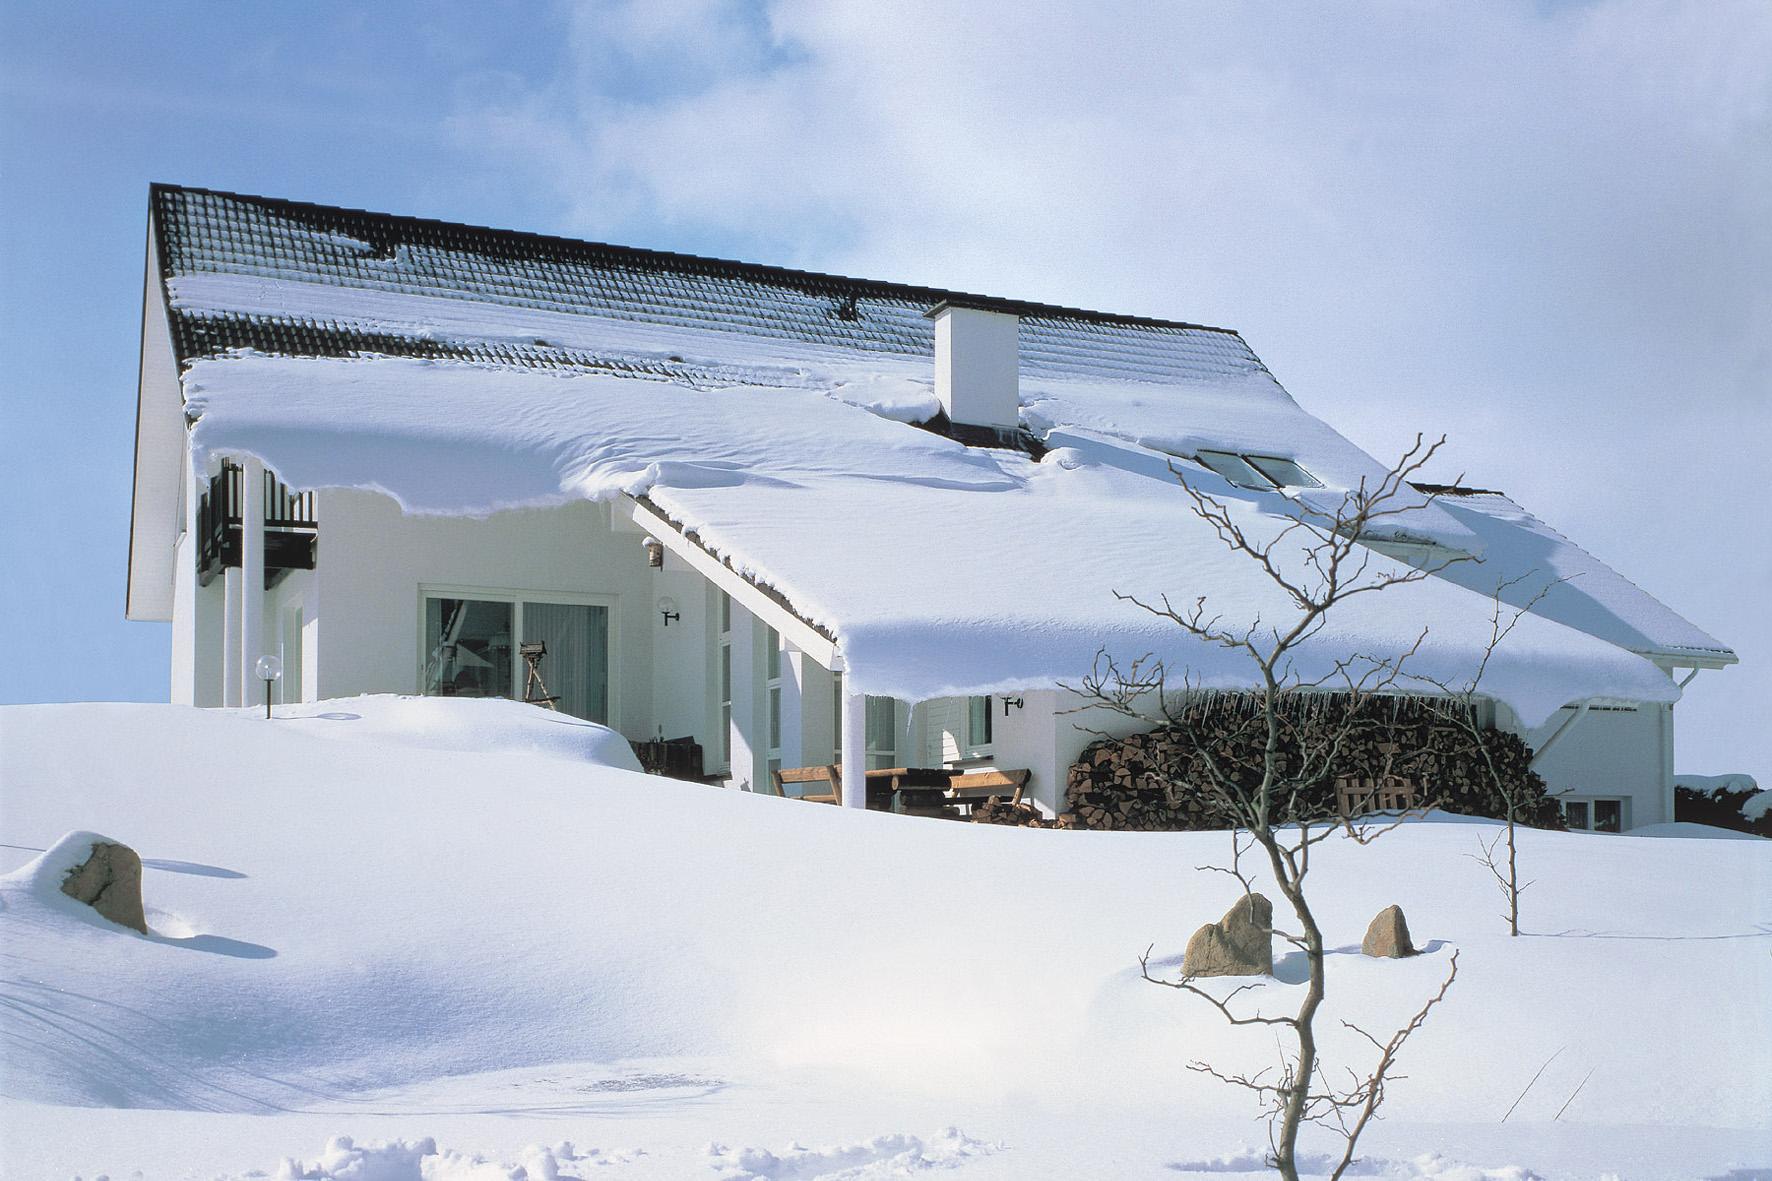 снег на крыше дома картинки сам себе